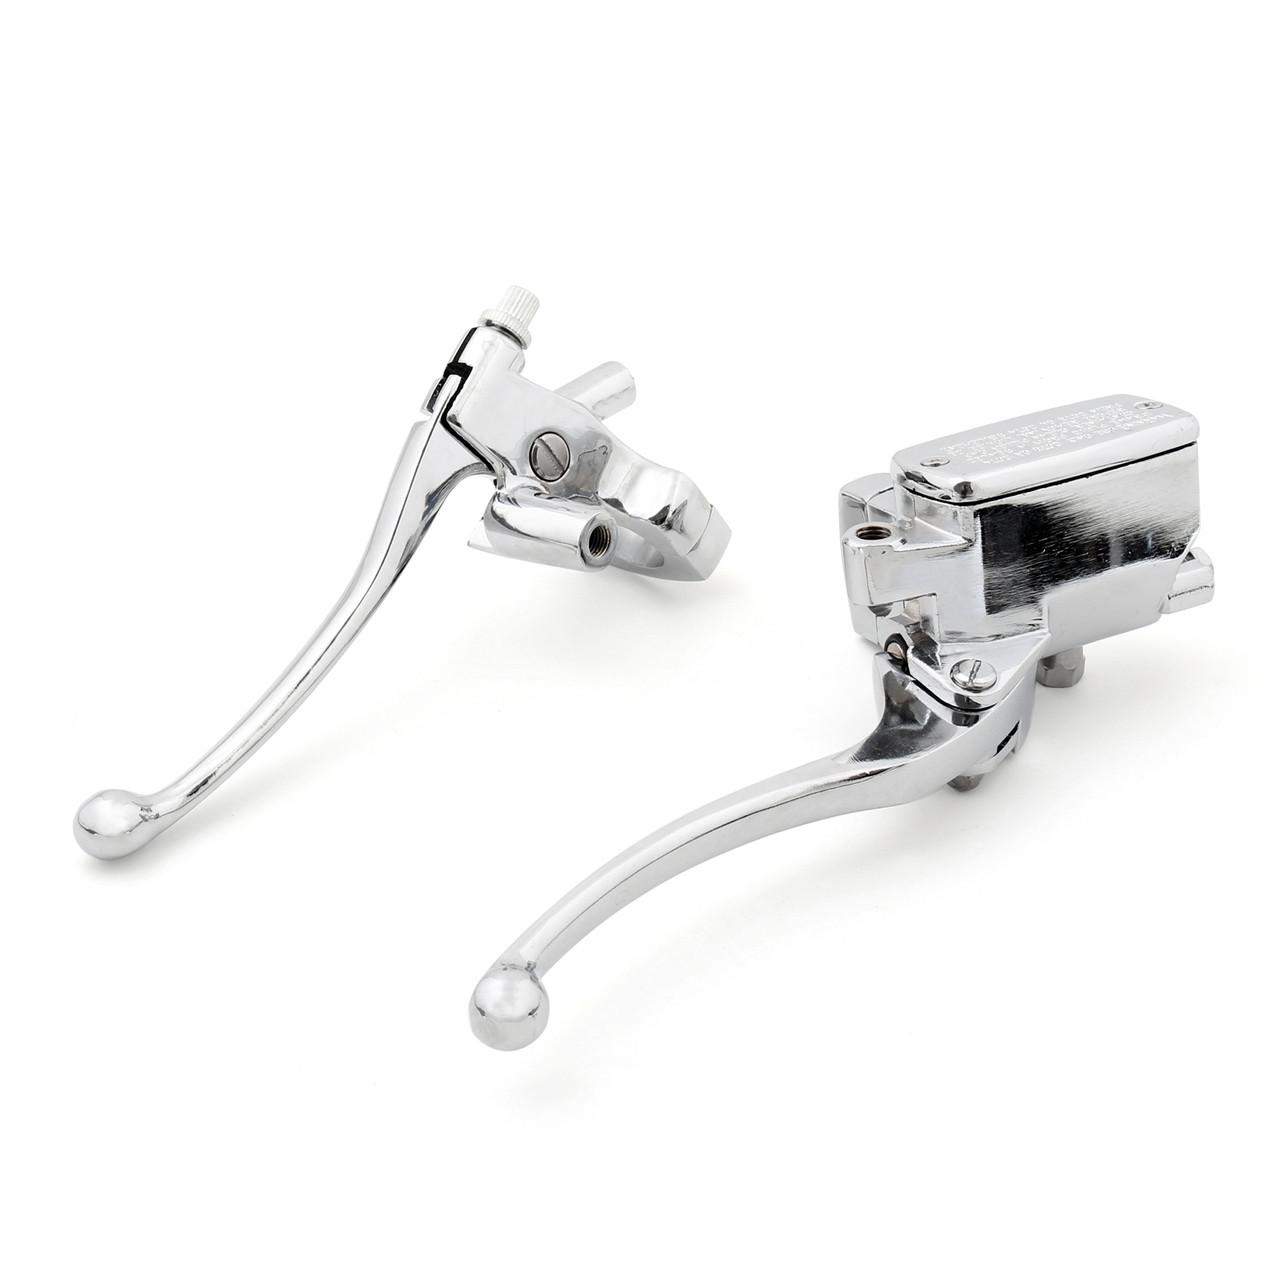 Levers Set Hydraulic Brake Cable Clutch Honda VT1300 VT1300CR Stateline (2010-2014) Chrome